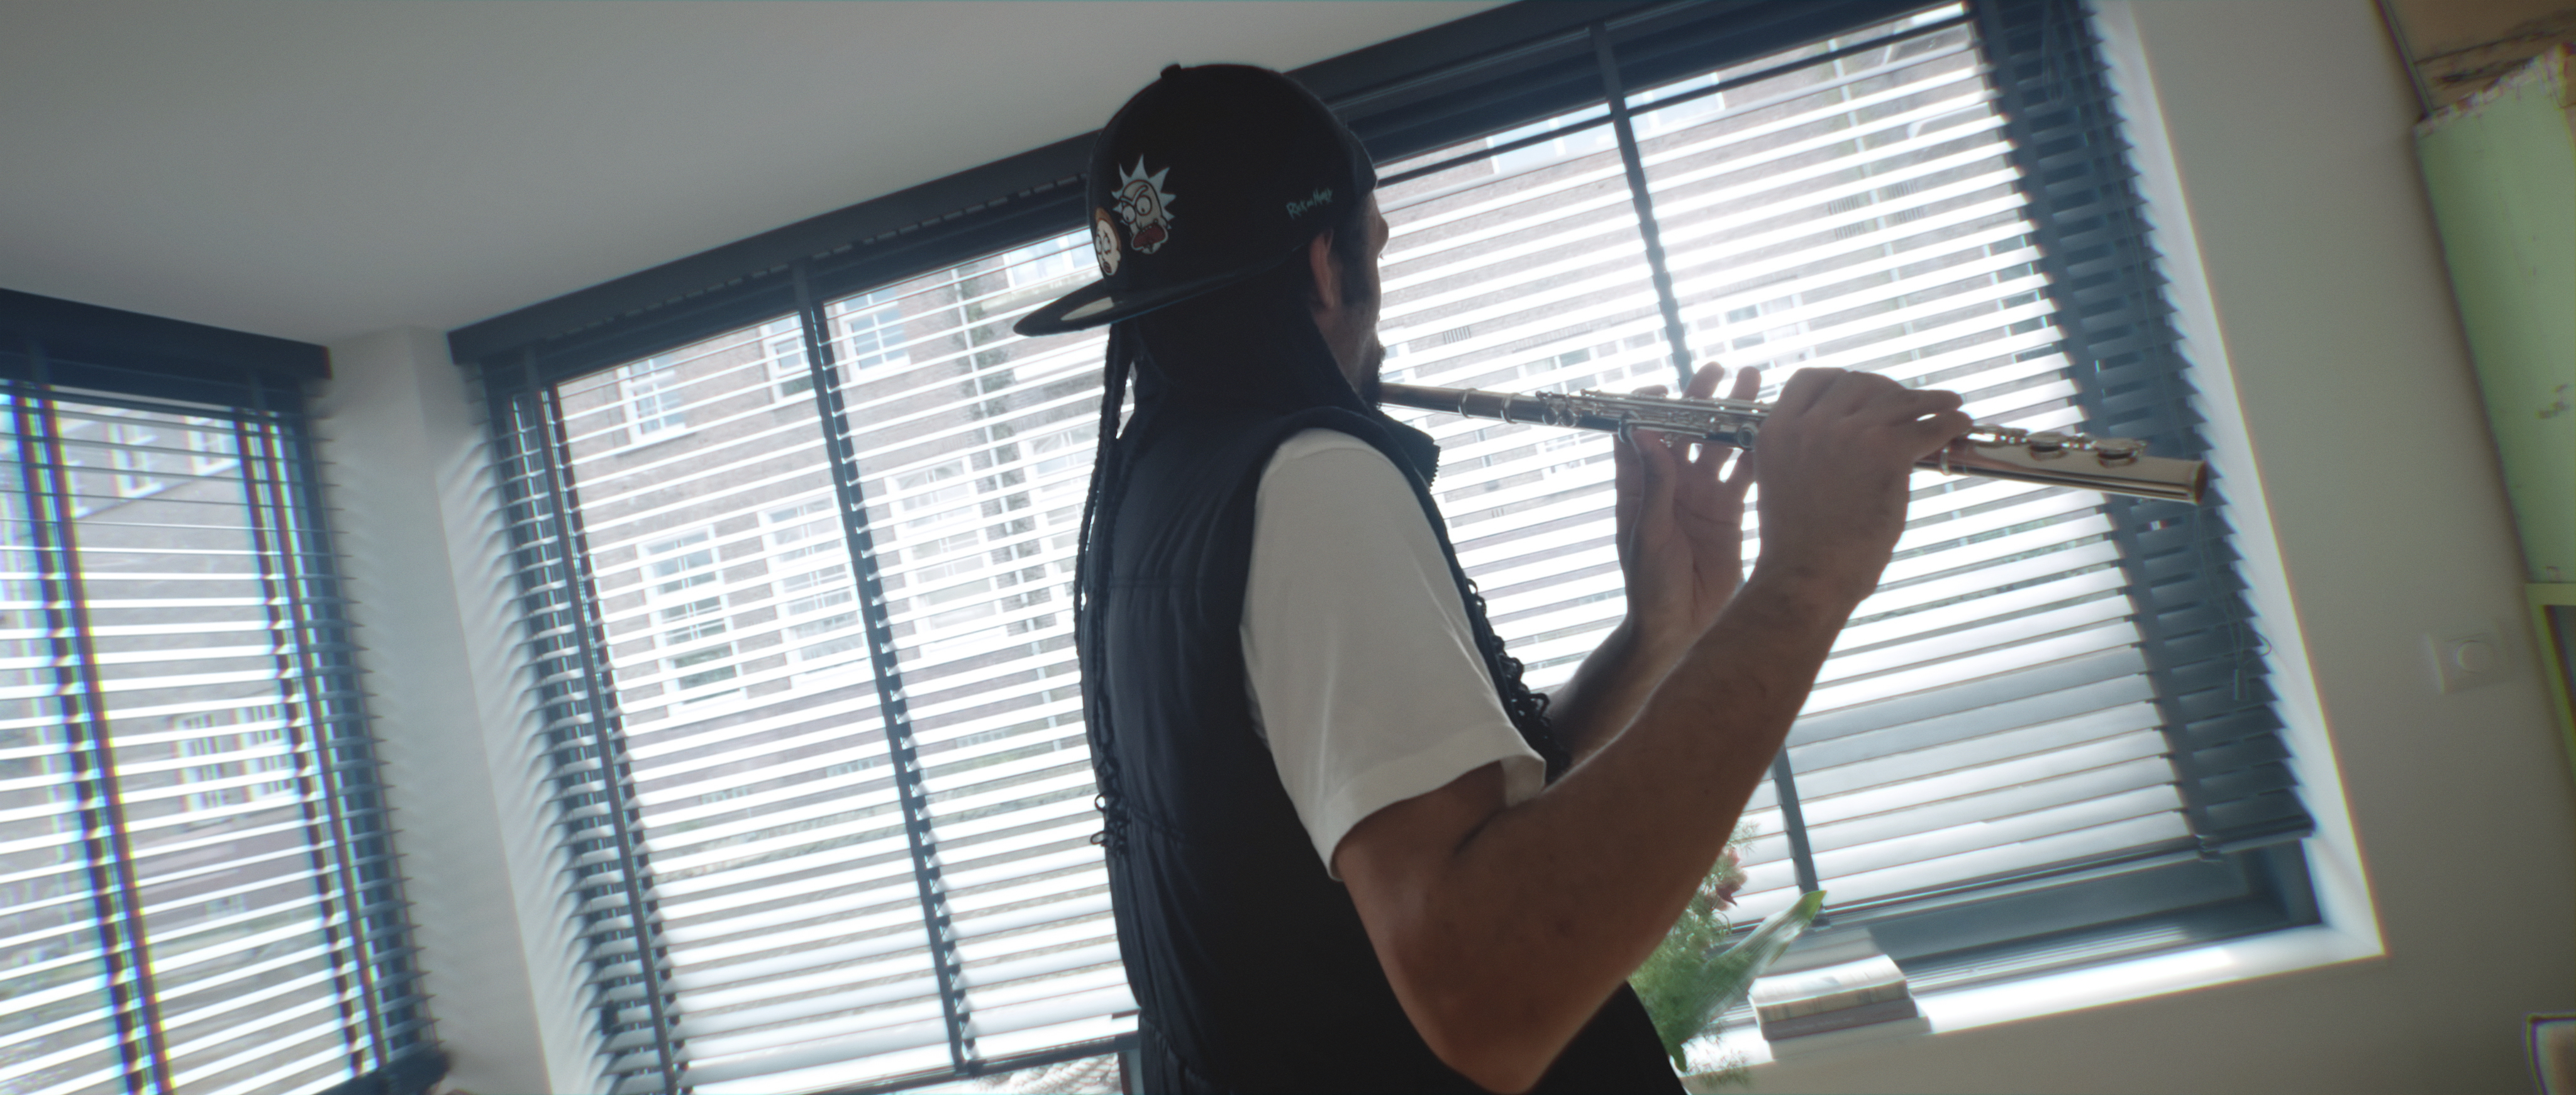 MMM – Fluit